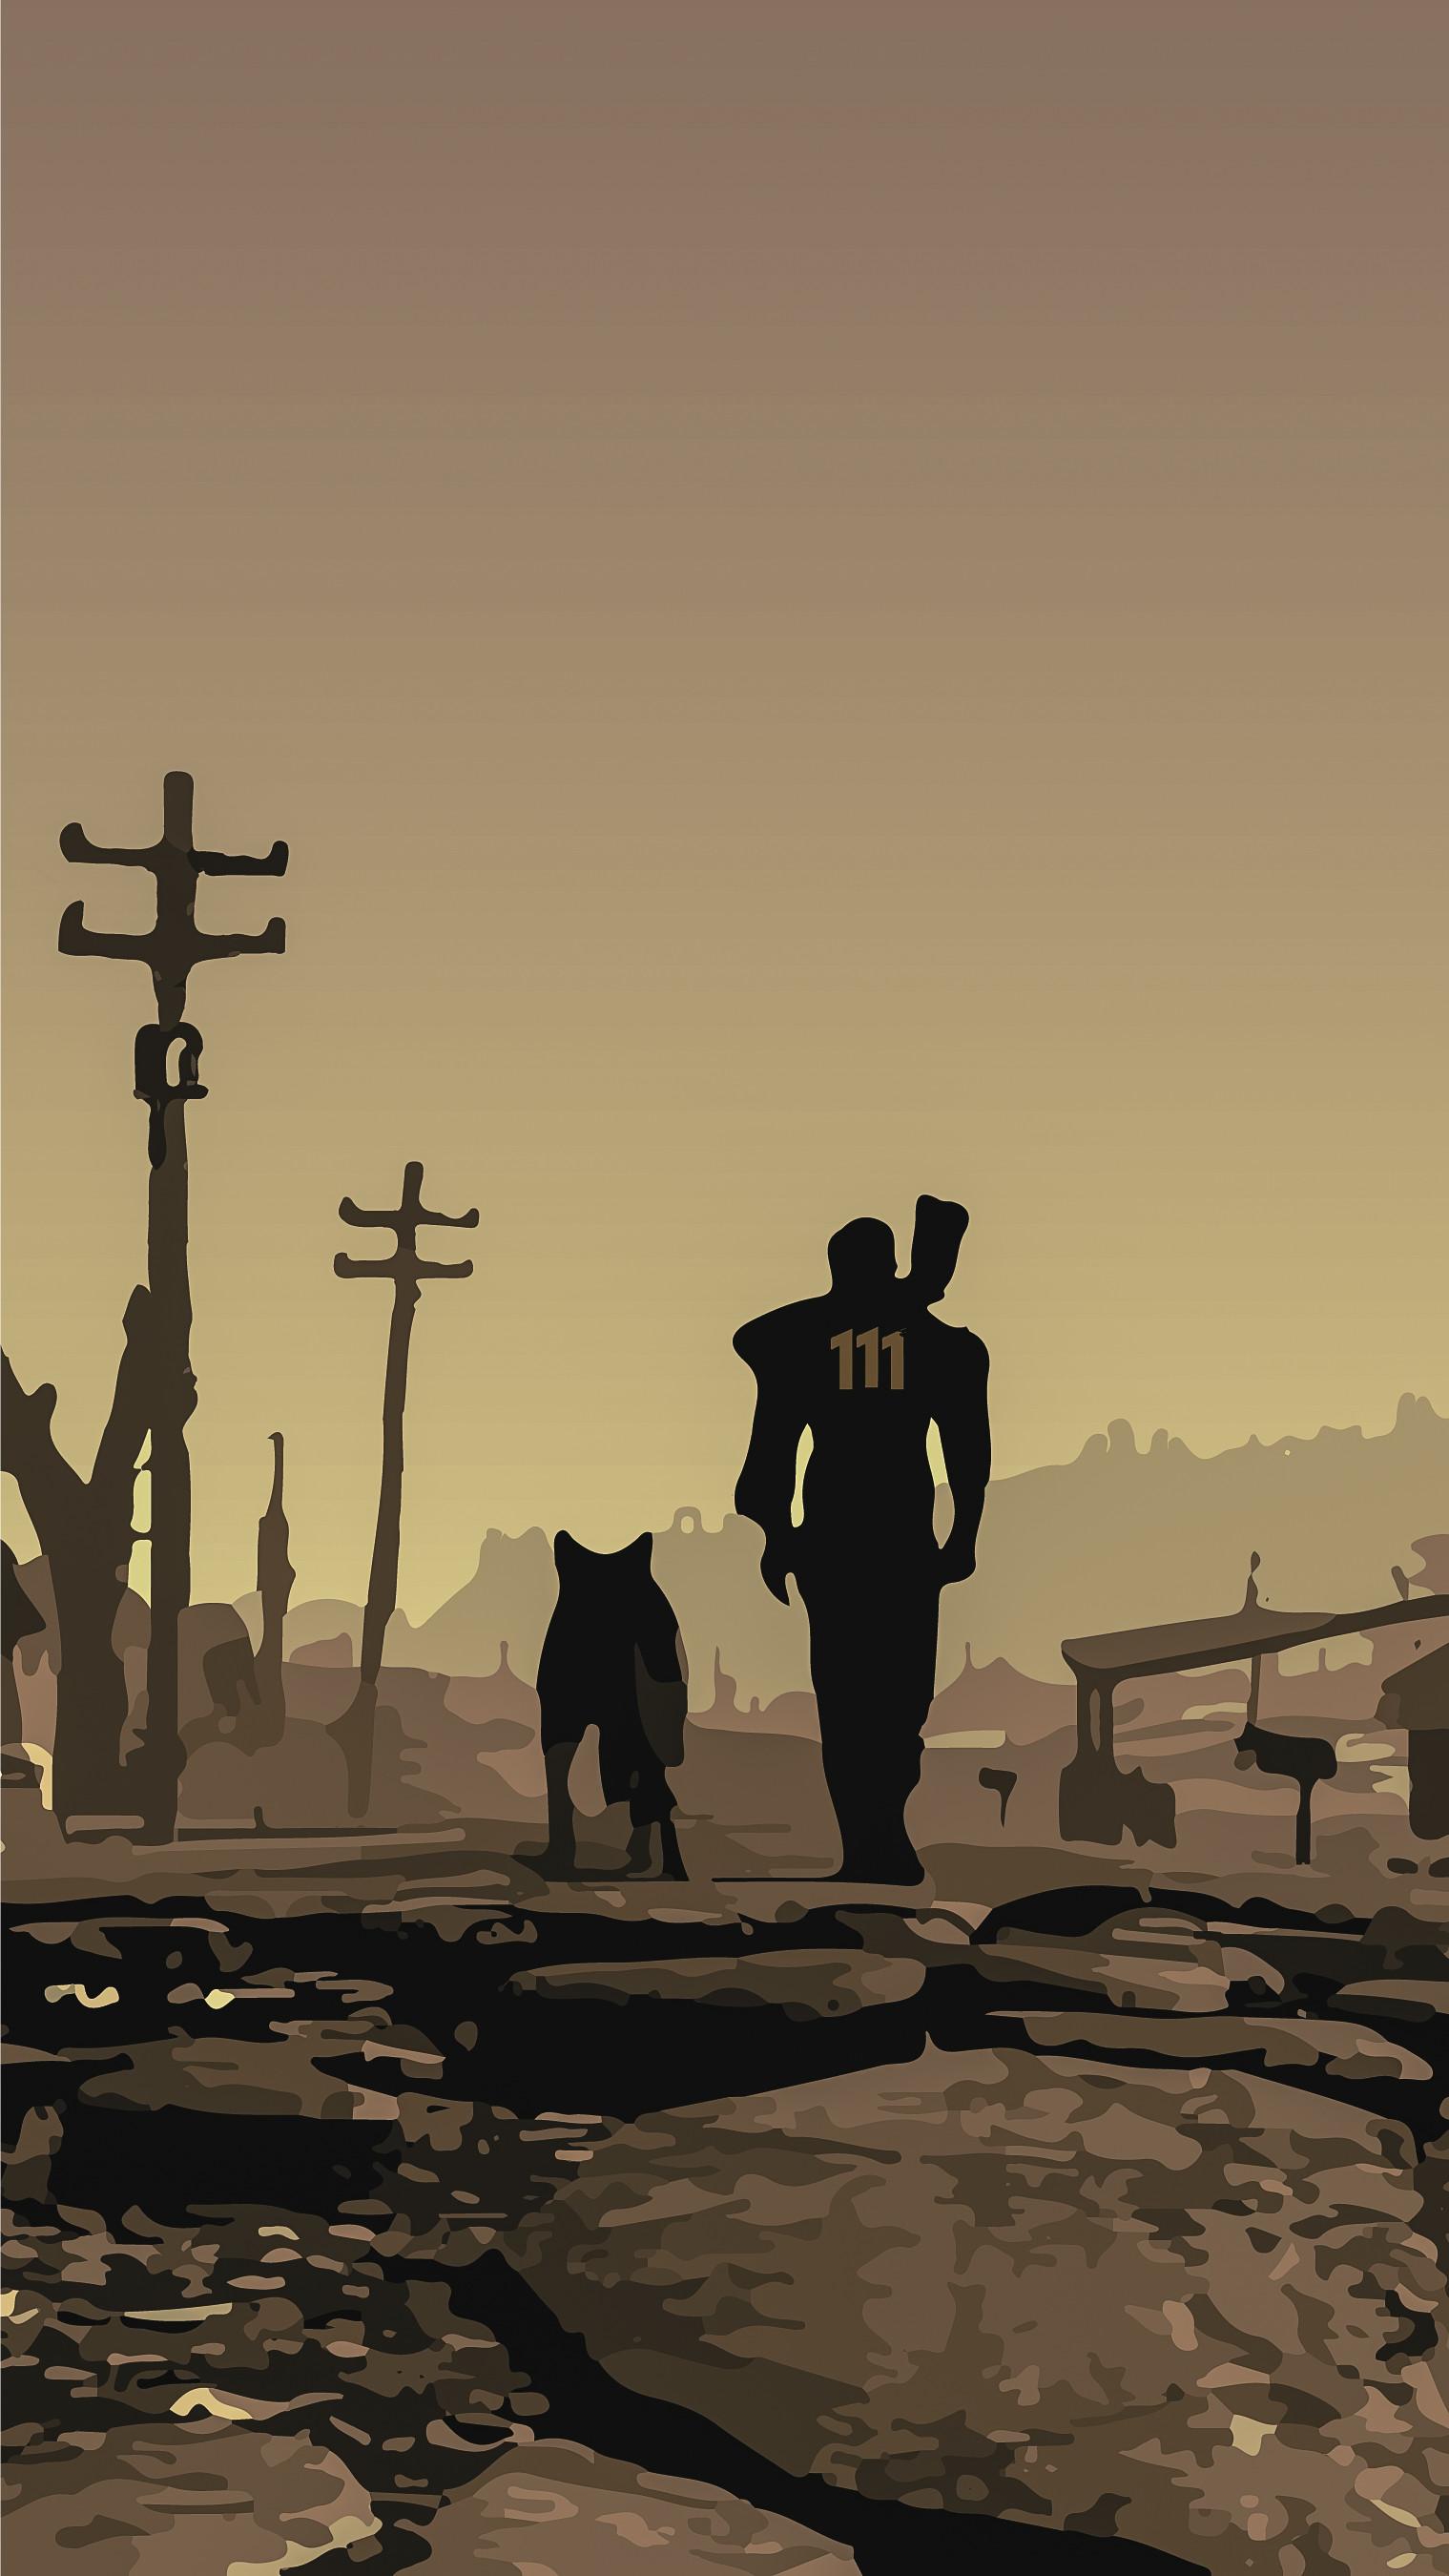 Fallout Material wallpaper